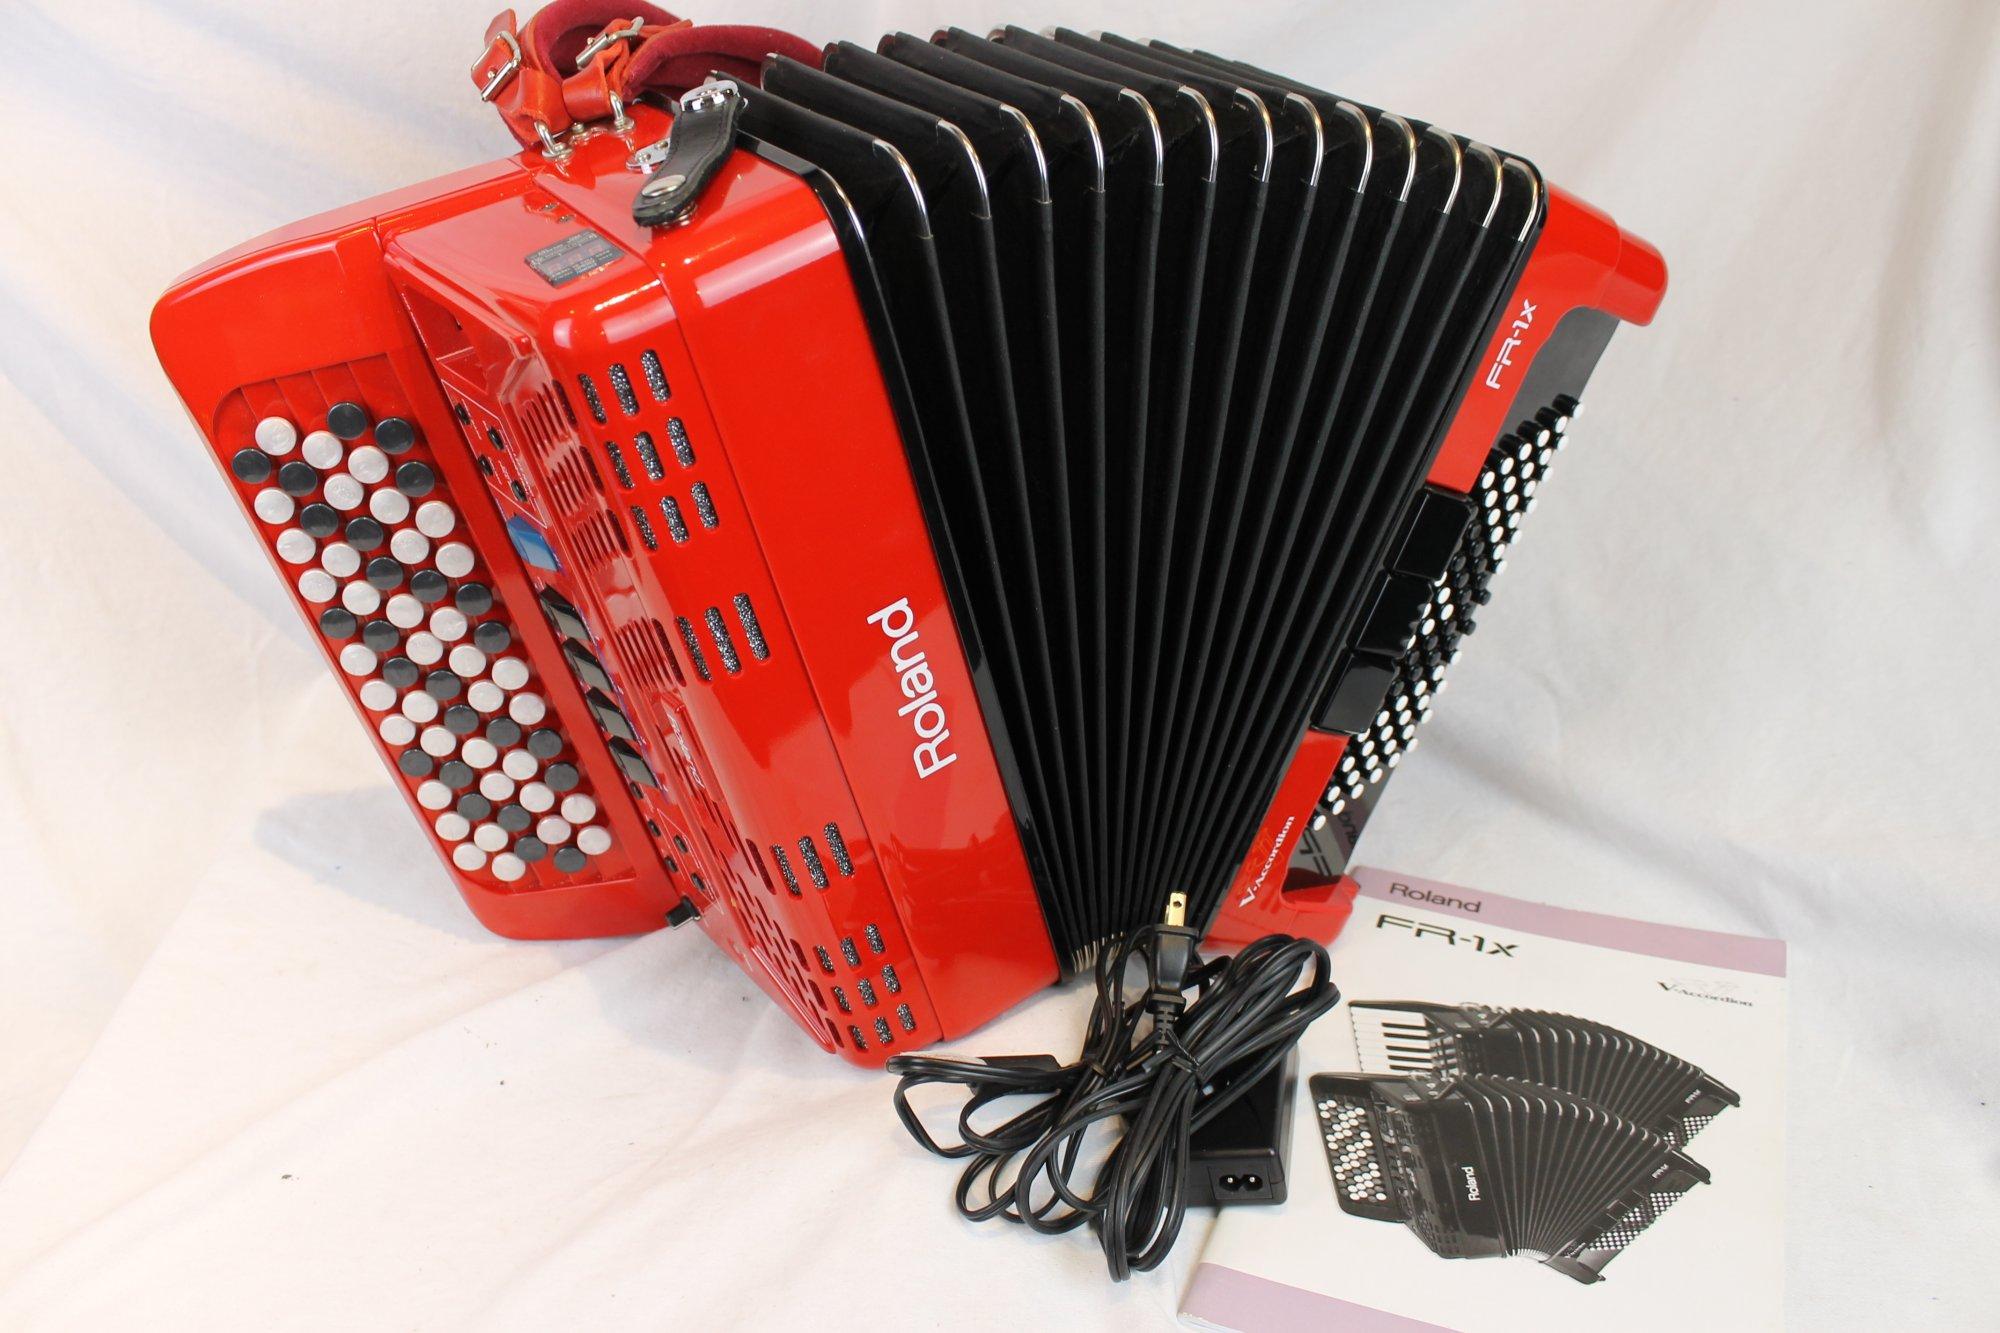 3850 - Red Roland FR-1XB Chromatic Button Accordion 62 72